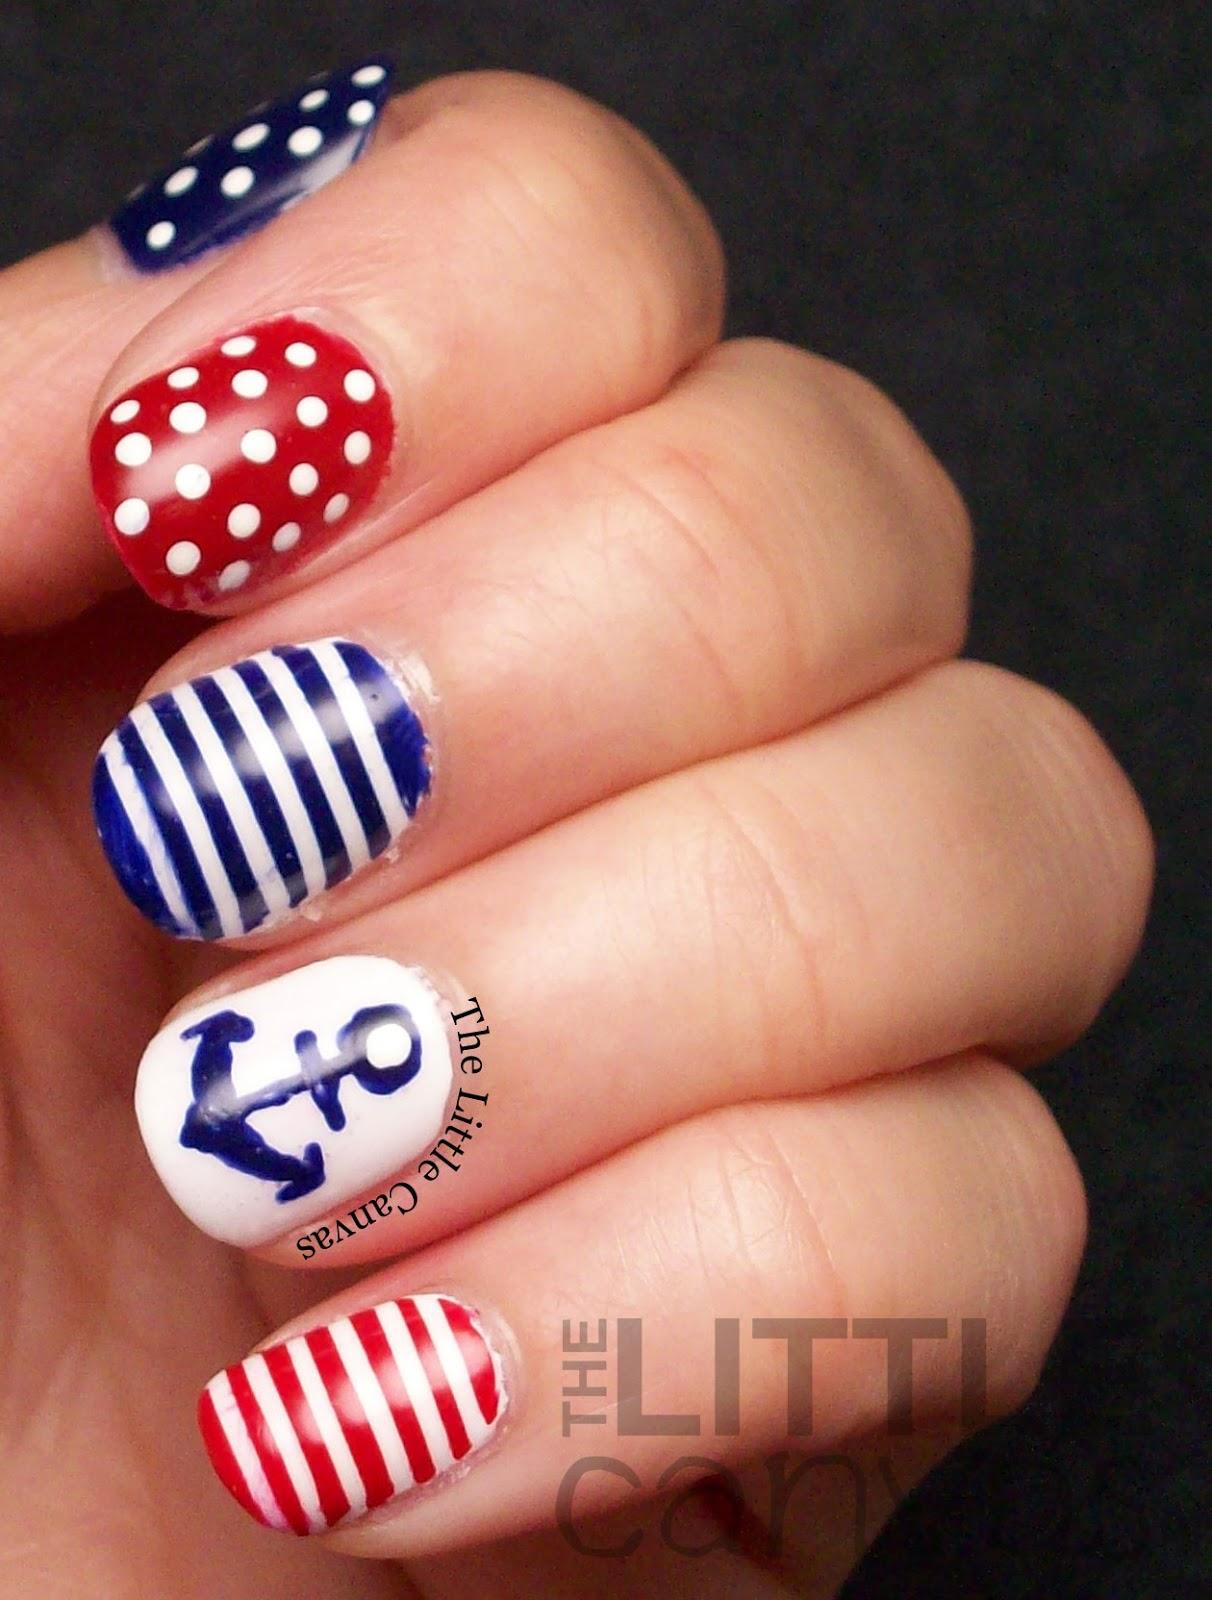 Twinsie Tuesday: Stripes: Nautical Nail Art - The Little Canvas